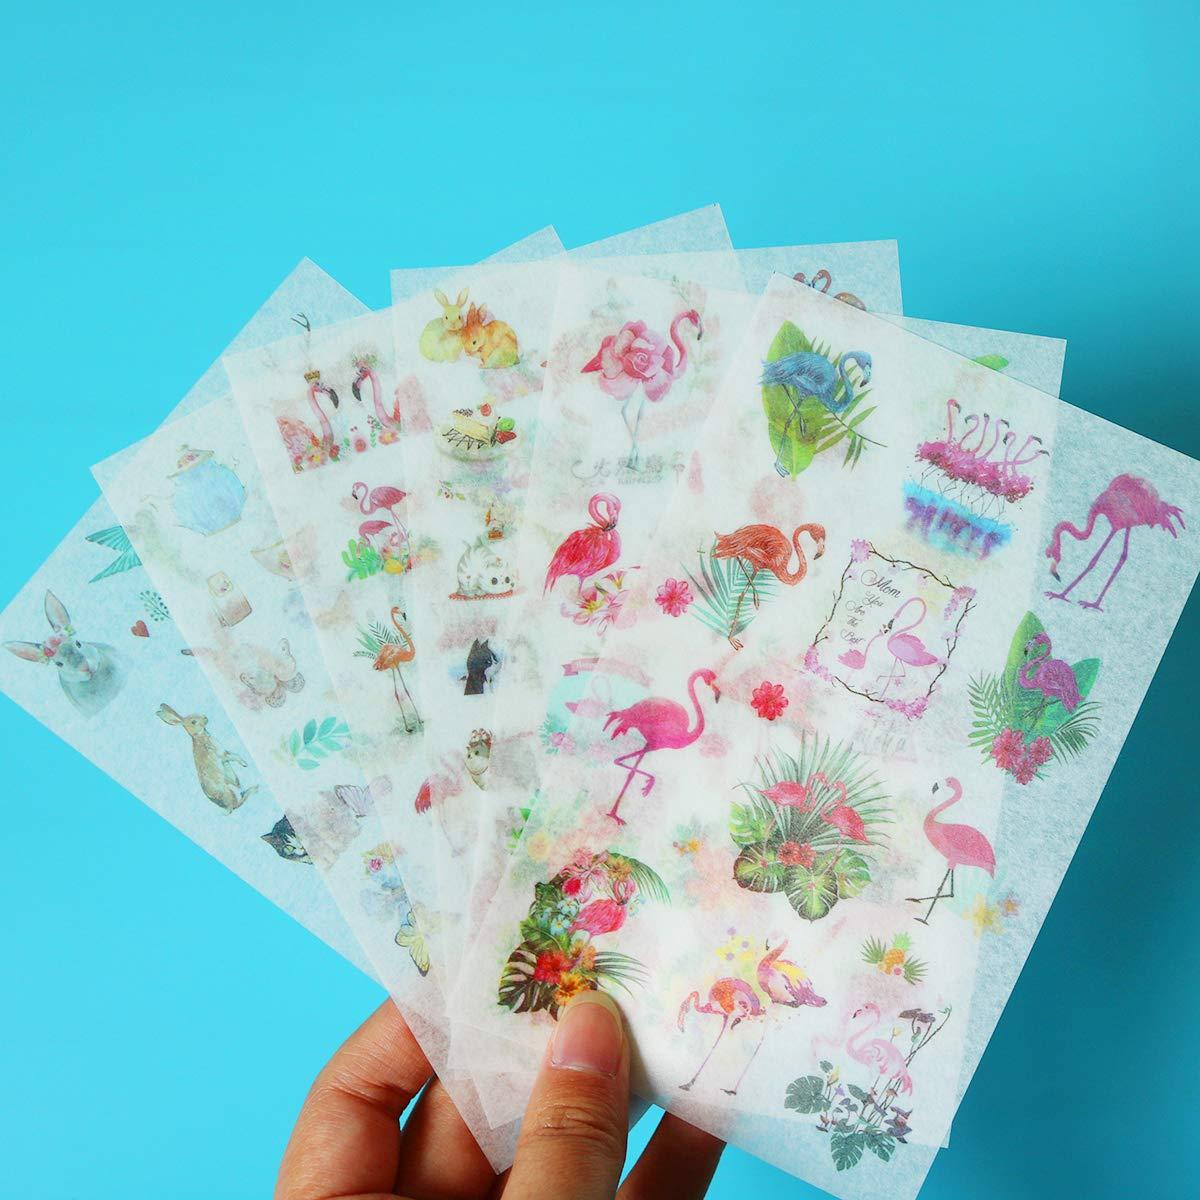 Flamingo Style Note Stickers, (6 Sheets) Garden Wildflowers Decorative Sticker for Scrapbooks, Notebook, Journal, Card Making, Album,Calendars,DIY Crafts (Flamingo)